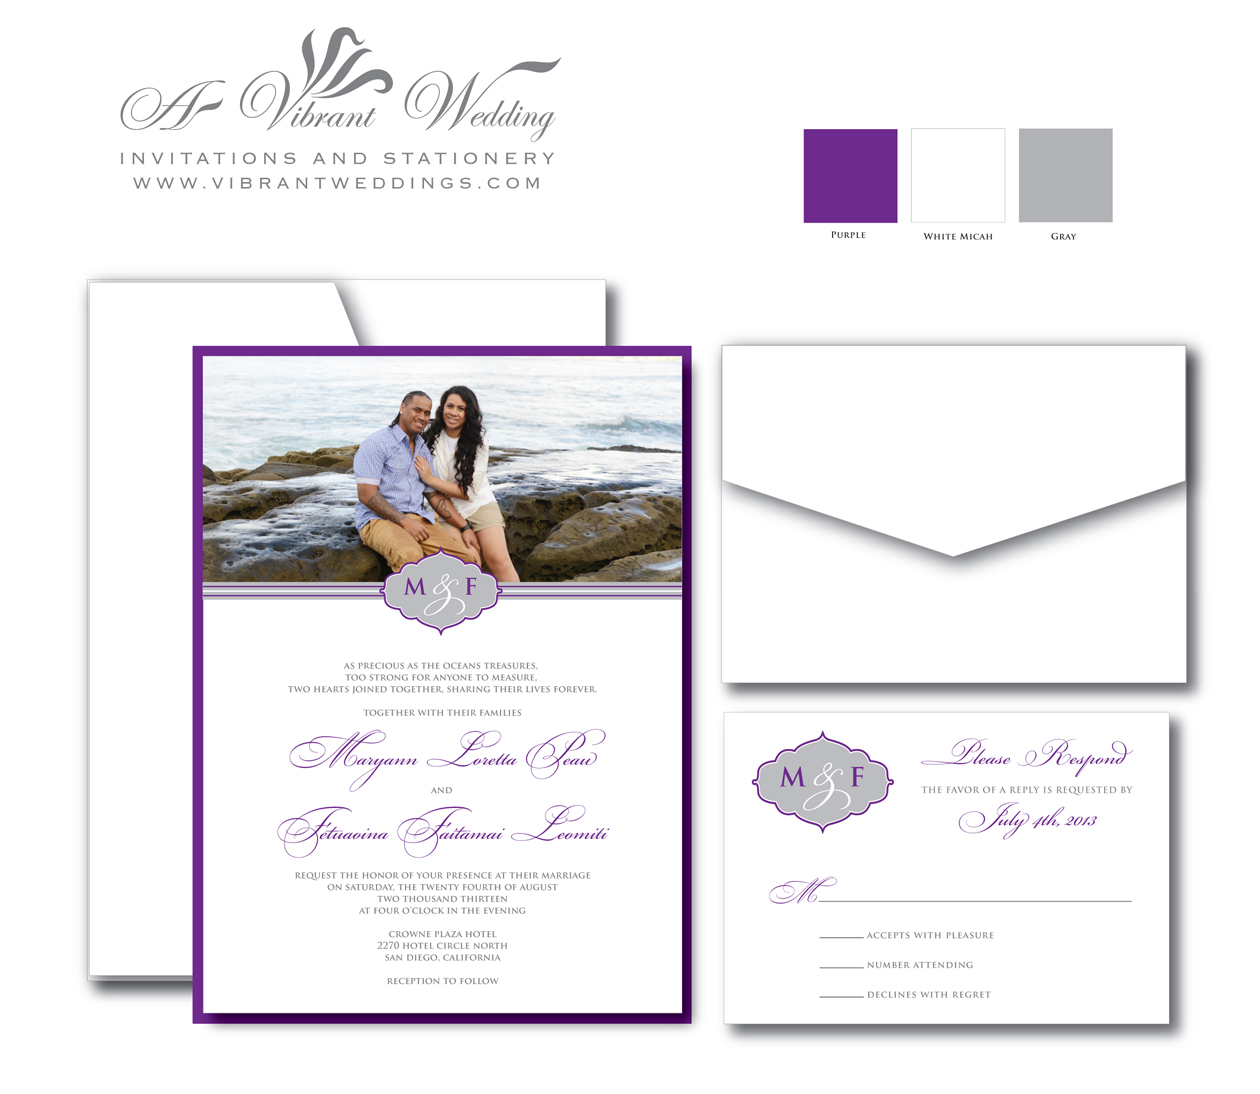 Most Expensive Wedding Invitations: Purple And Gray Wedding Invitation